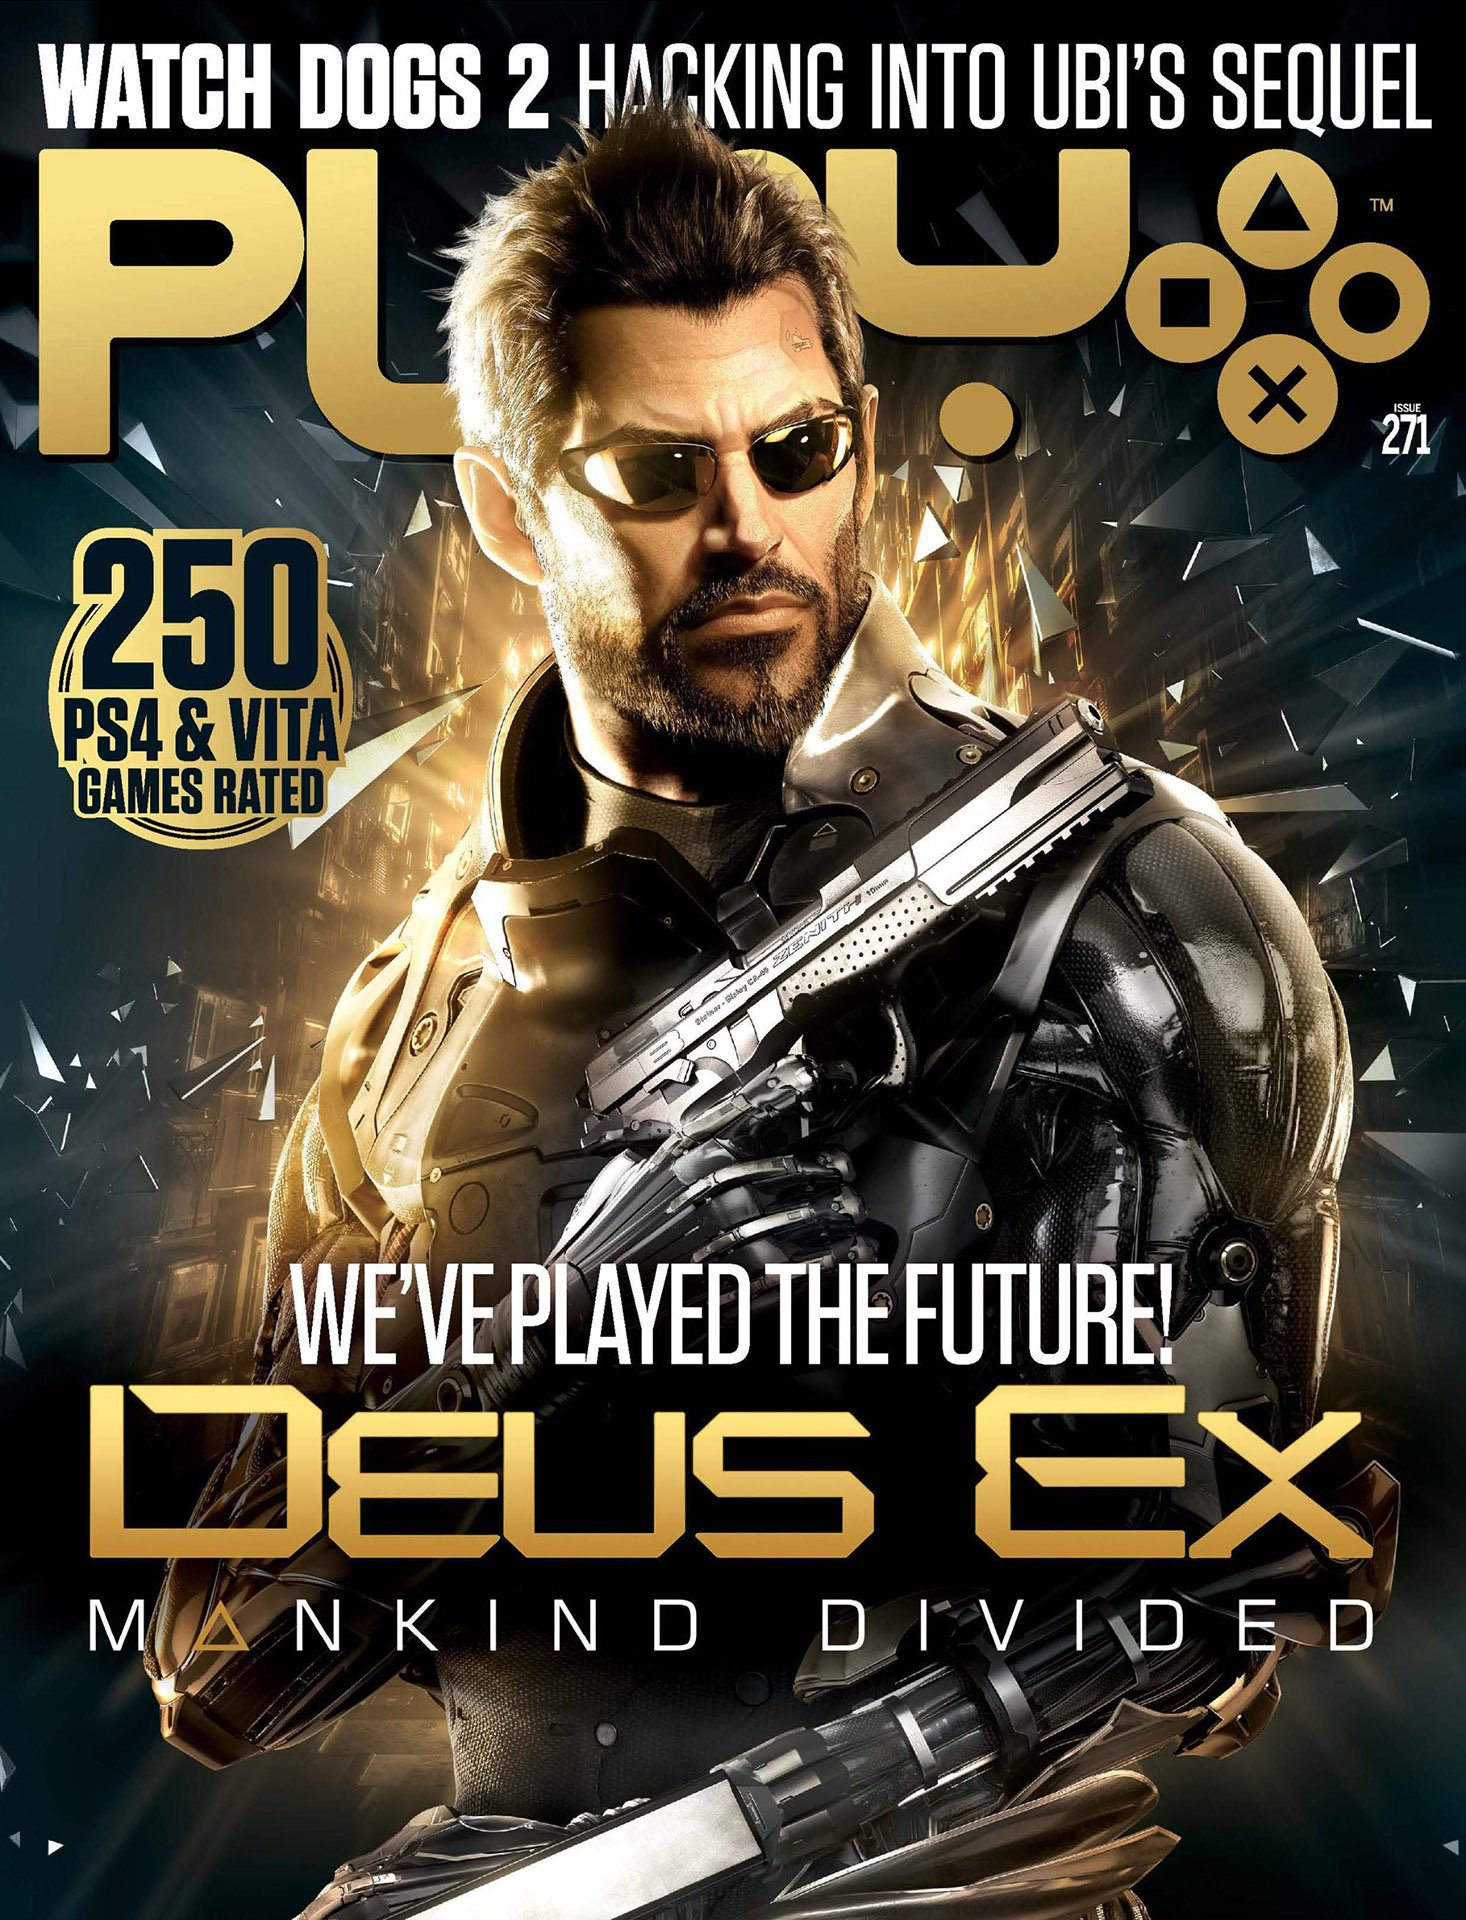 Play UK 271 (July 2016)